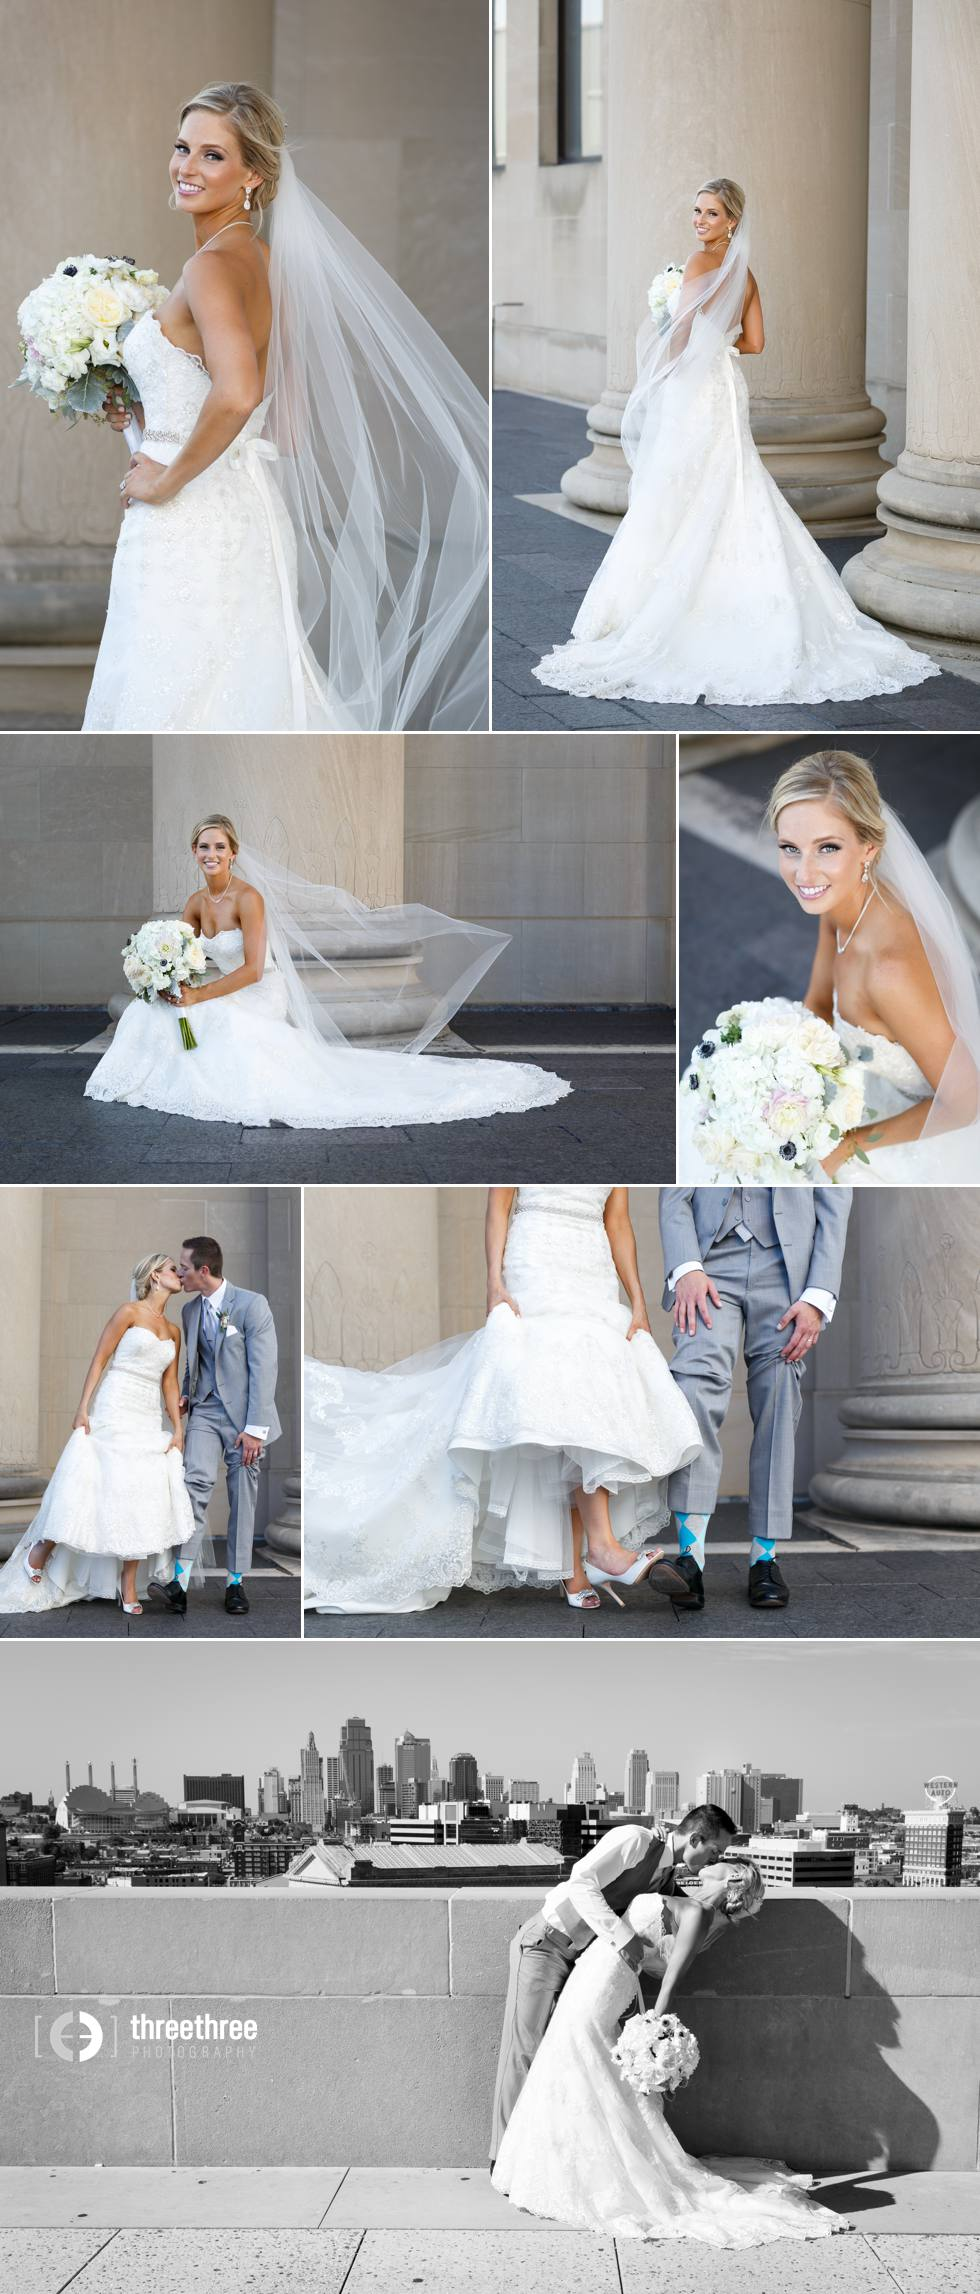 Natalie_AJ_wedding 11